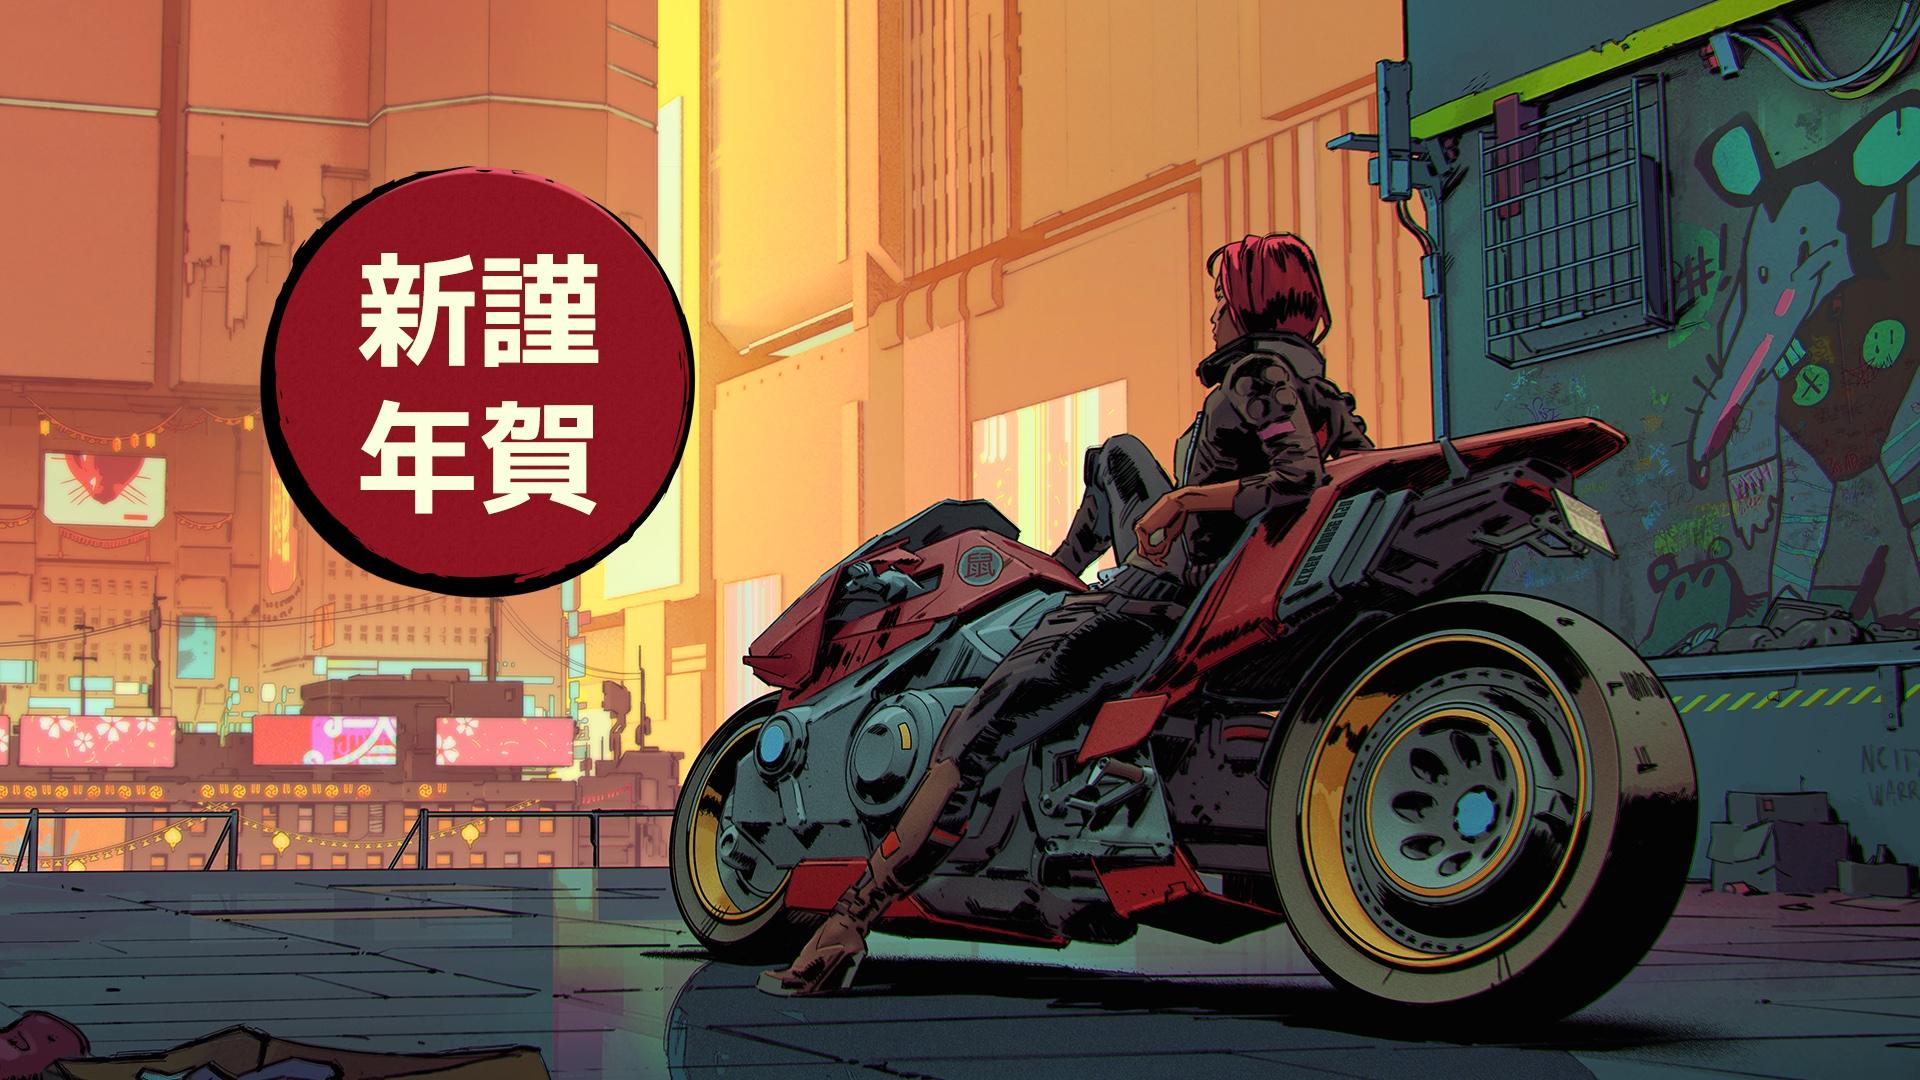 General 1920x1080 artwork digital art drawing illustration cyberpunk Cyberpunk 2077 CD Projekt RED futuristic vehicle motorcycle women Akira